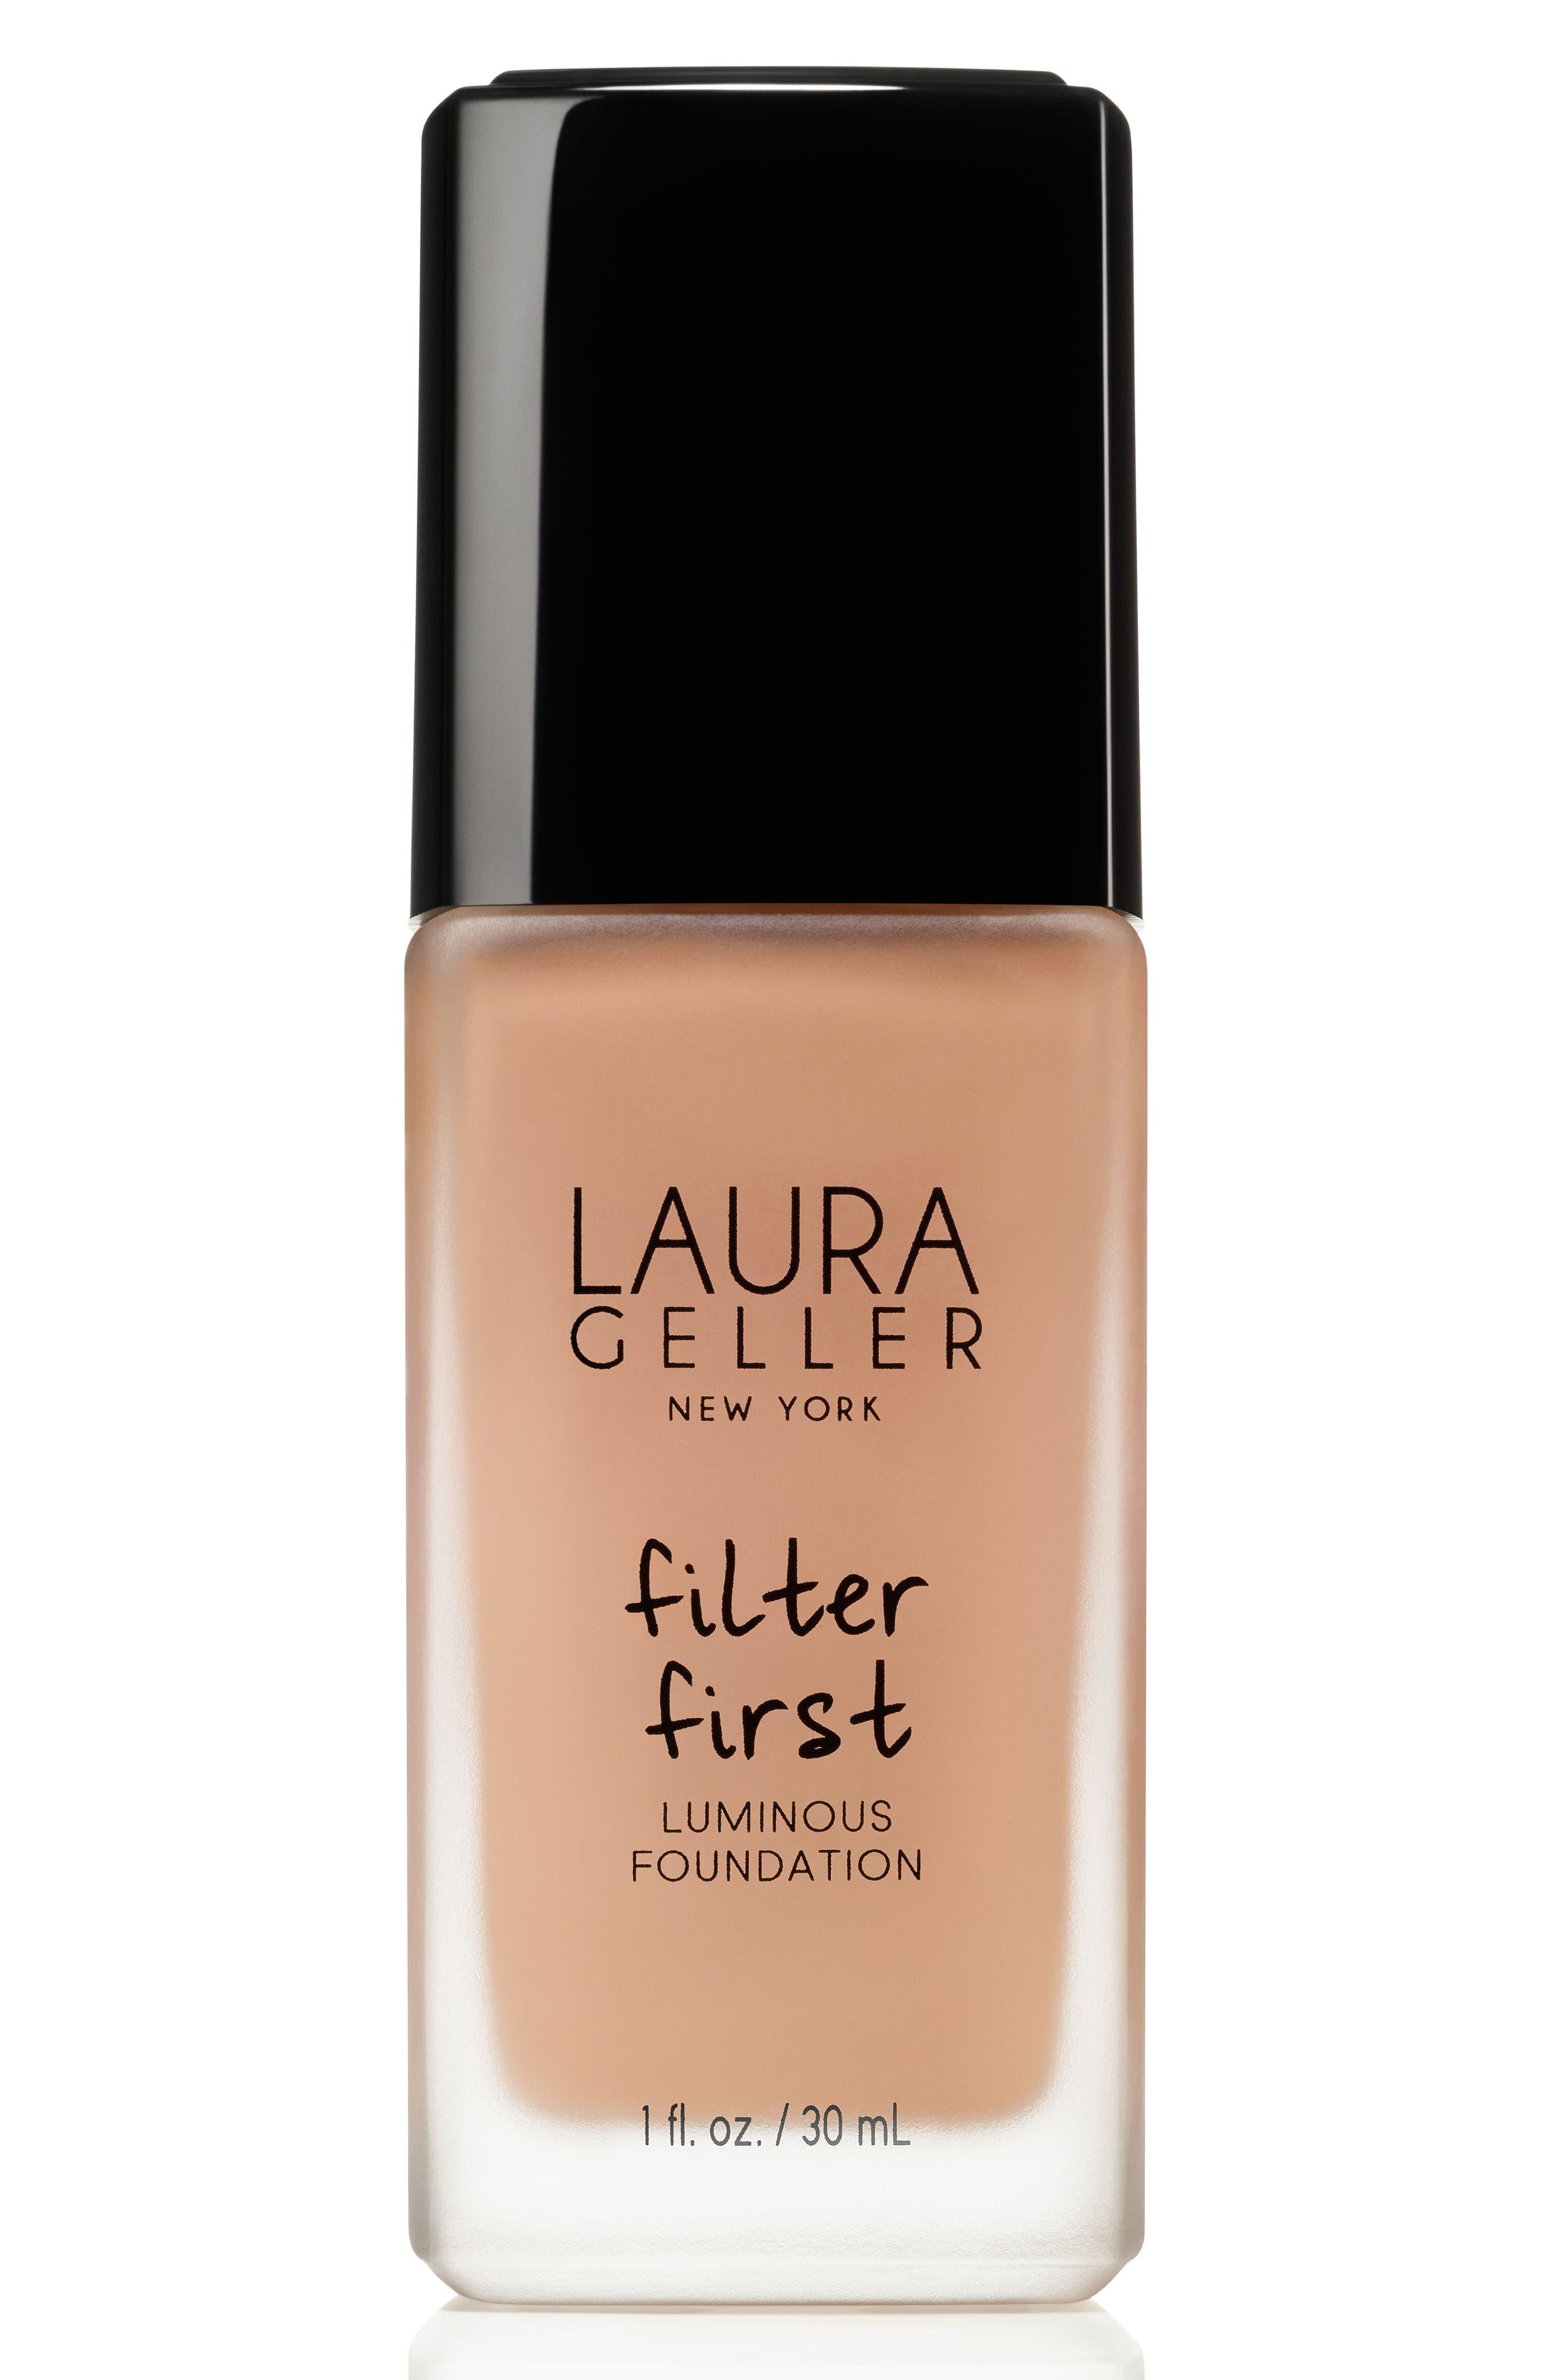 Image of Laura Geller New York Filter First Luminous Foundation - Golden Medium